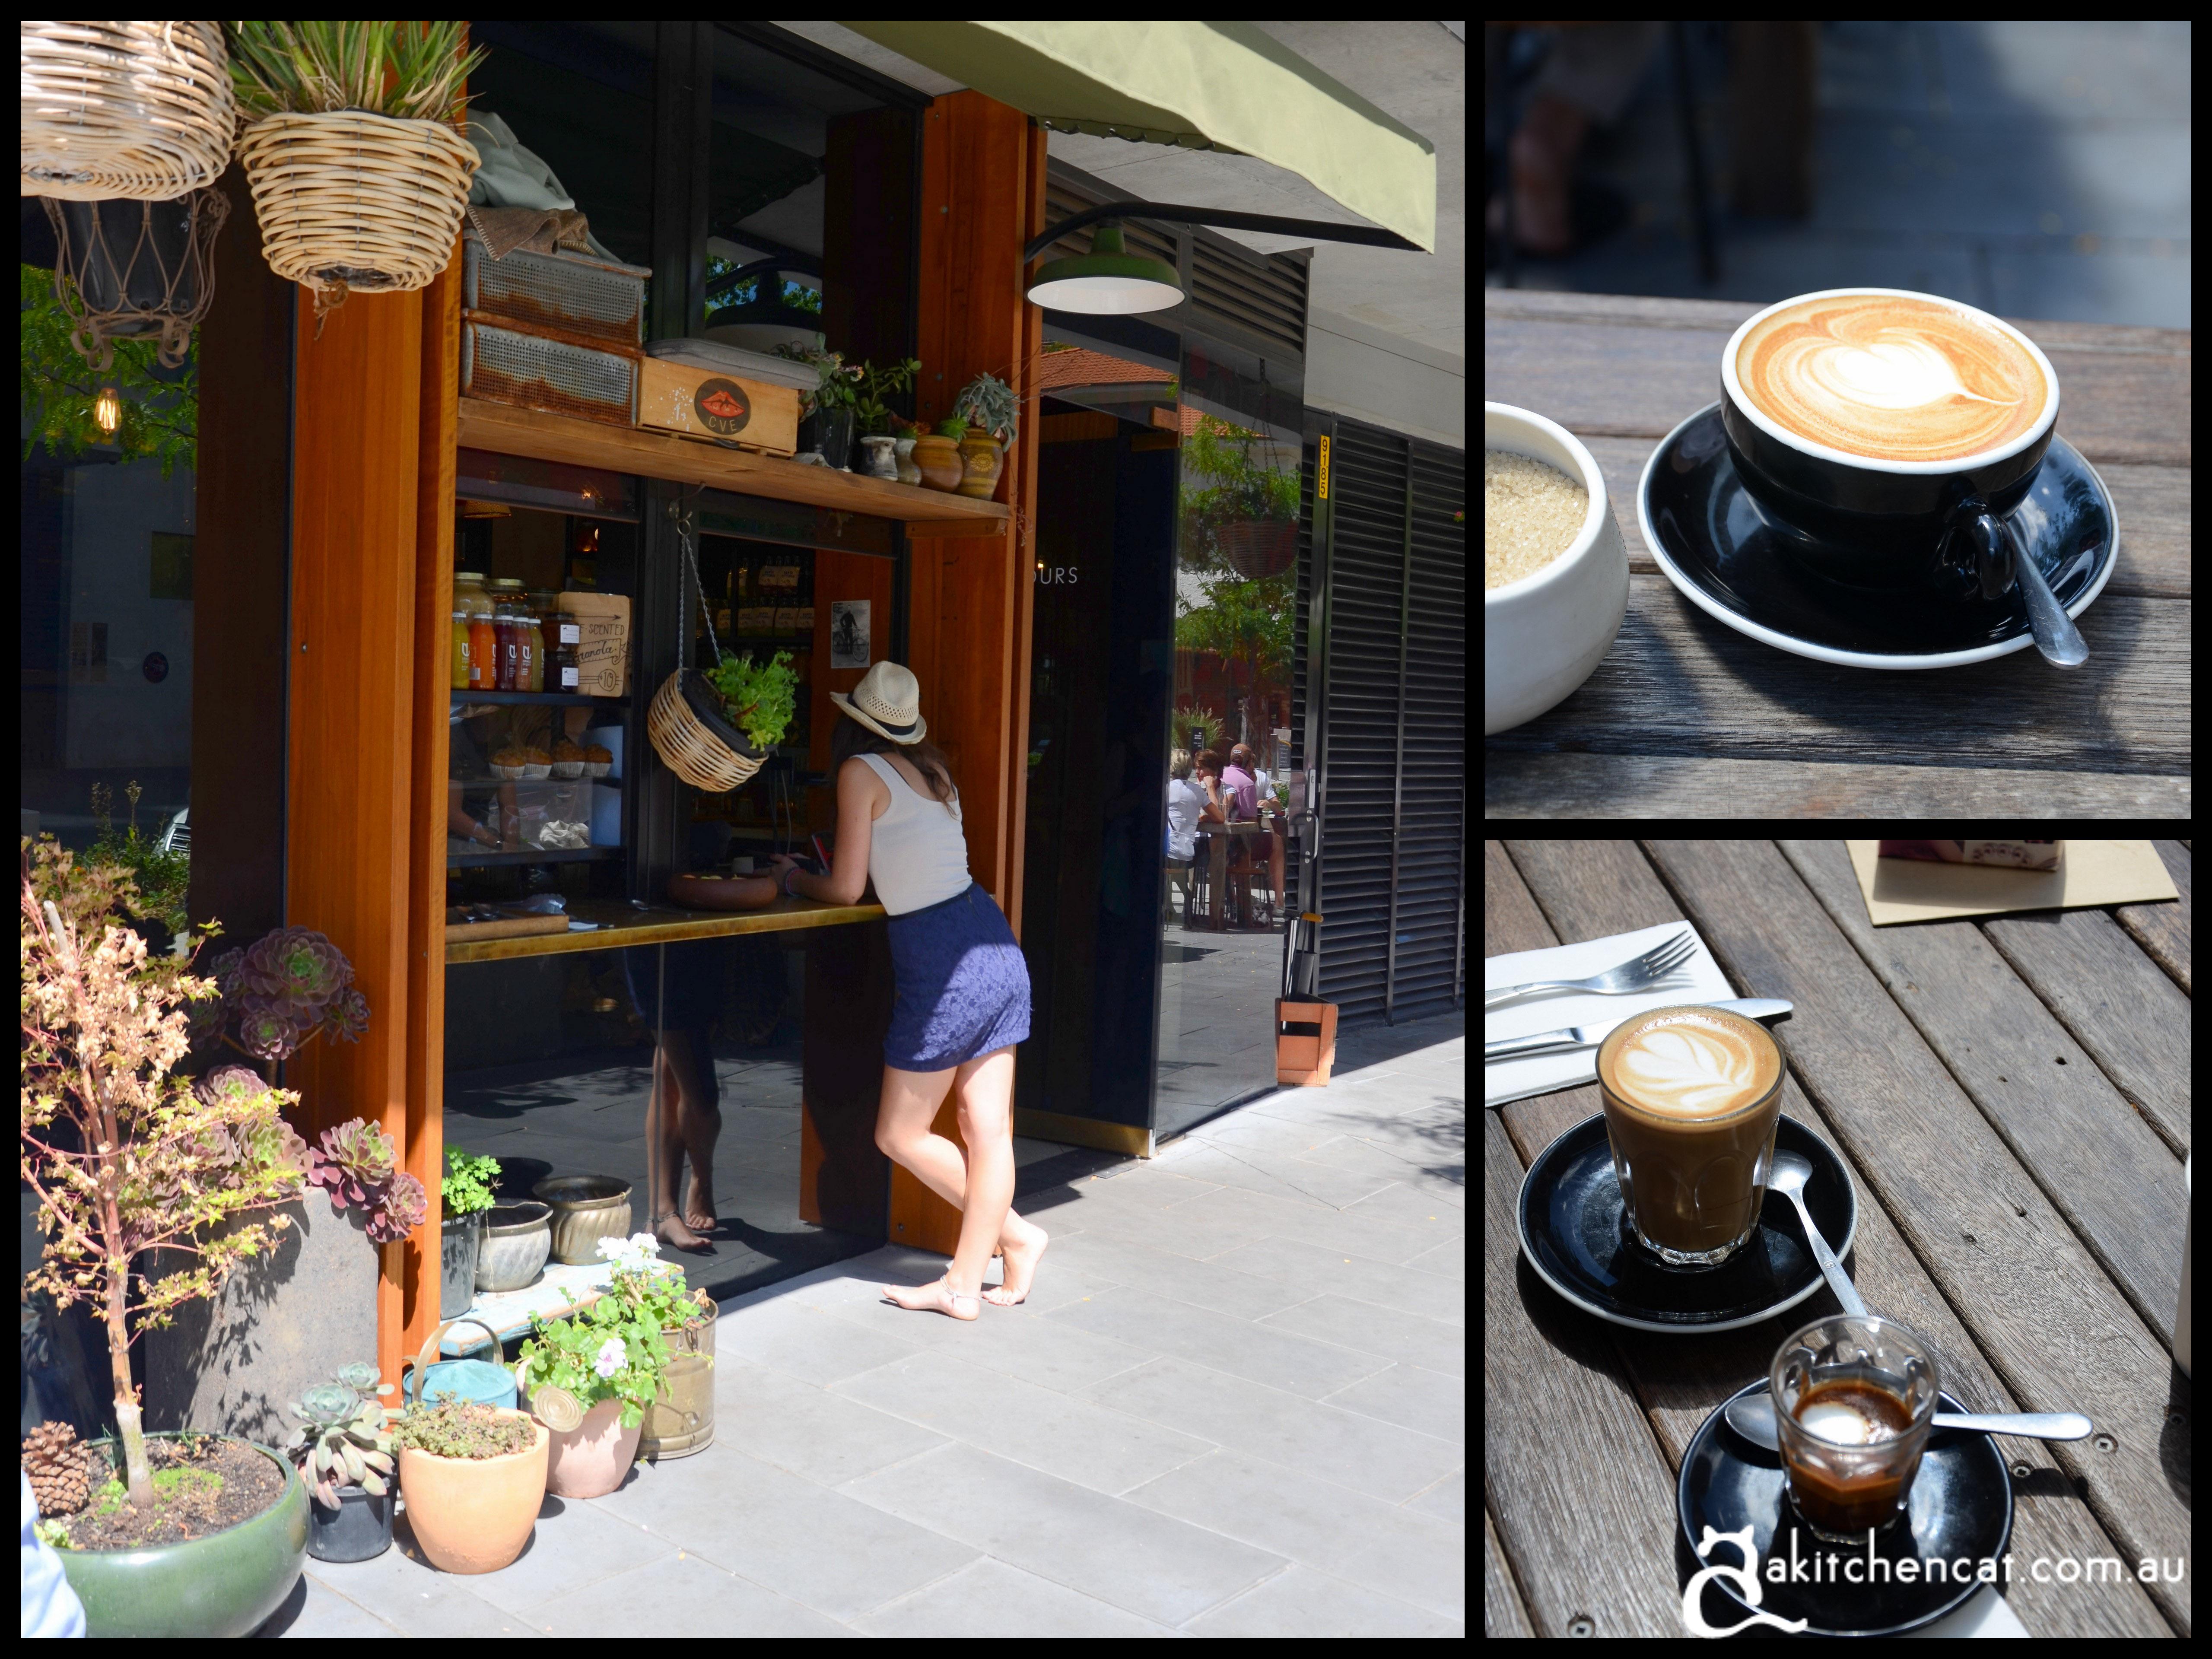 mocan coffee